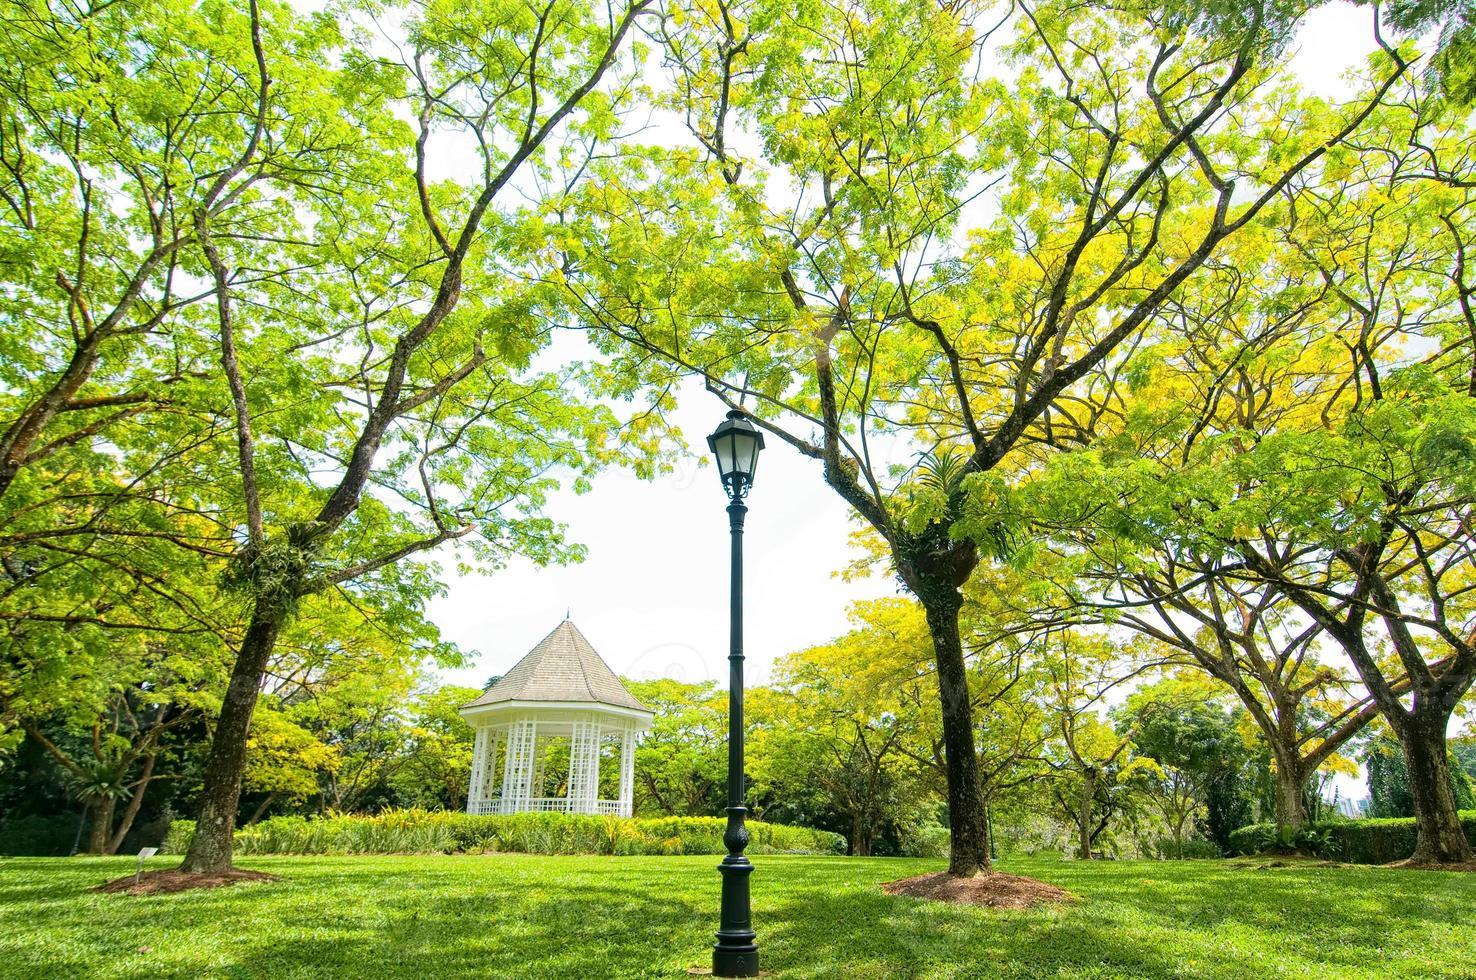 singapore botaniska trädgårdar, singapore foto